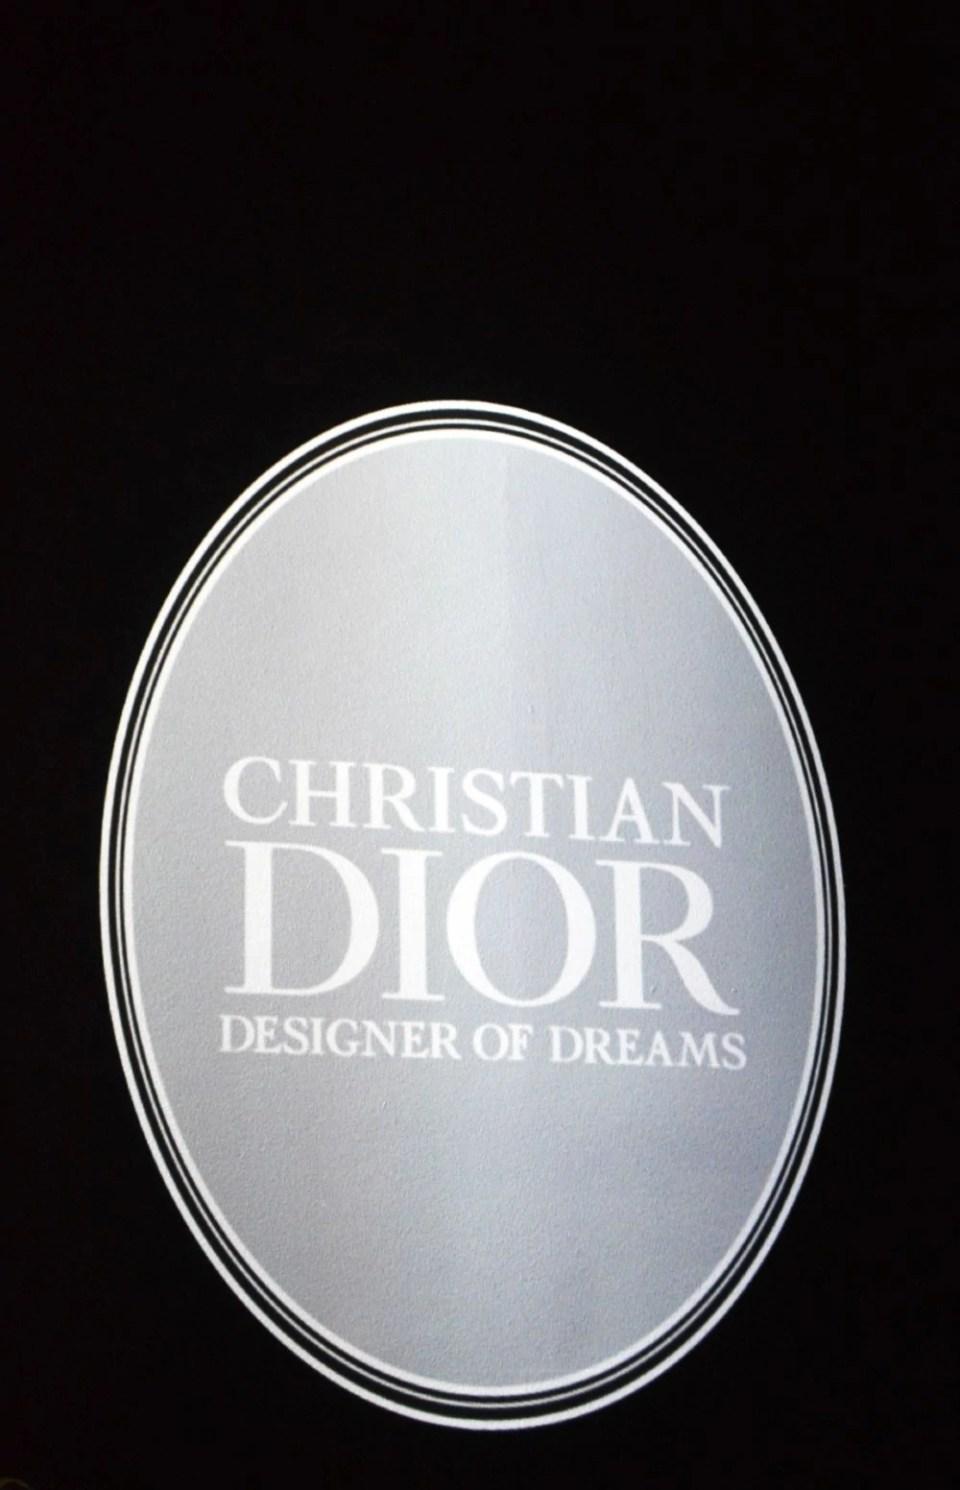 Christian Dior emblem.jpg